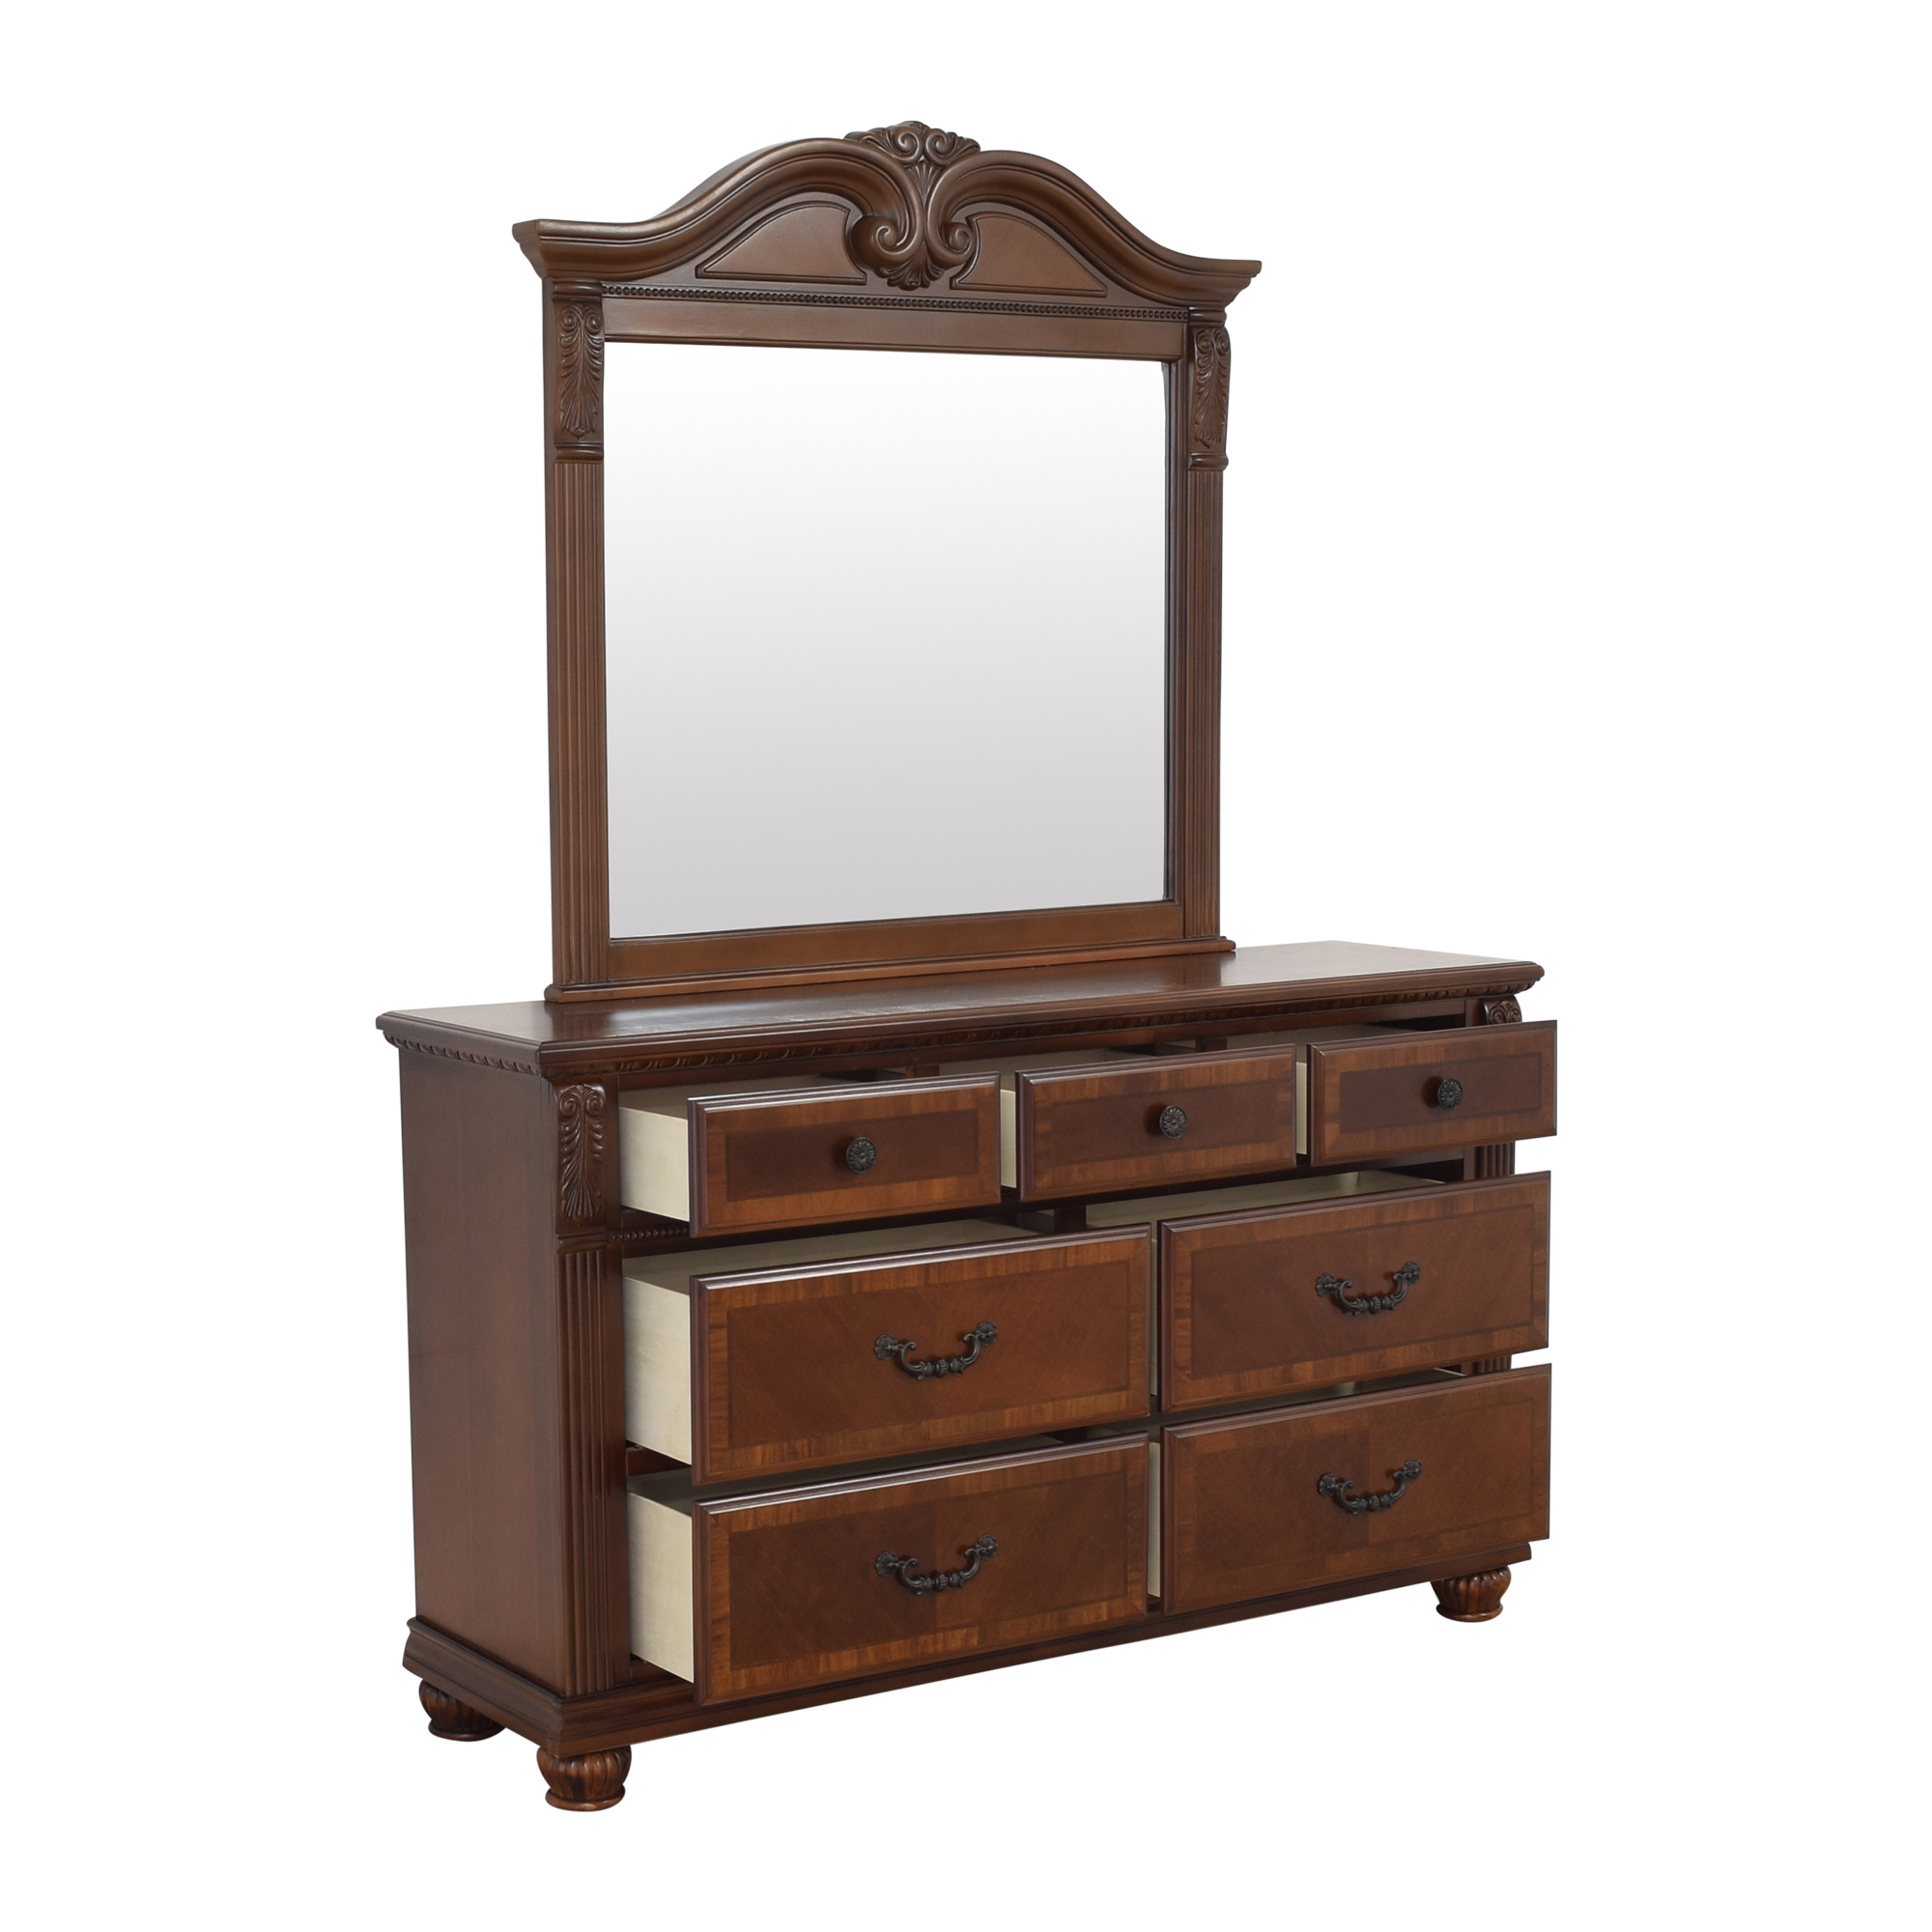 Raymour & Flanigan Raymour & Flanigan Ashbury Dresser with Mirror brown